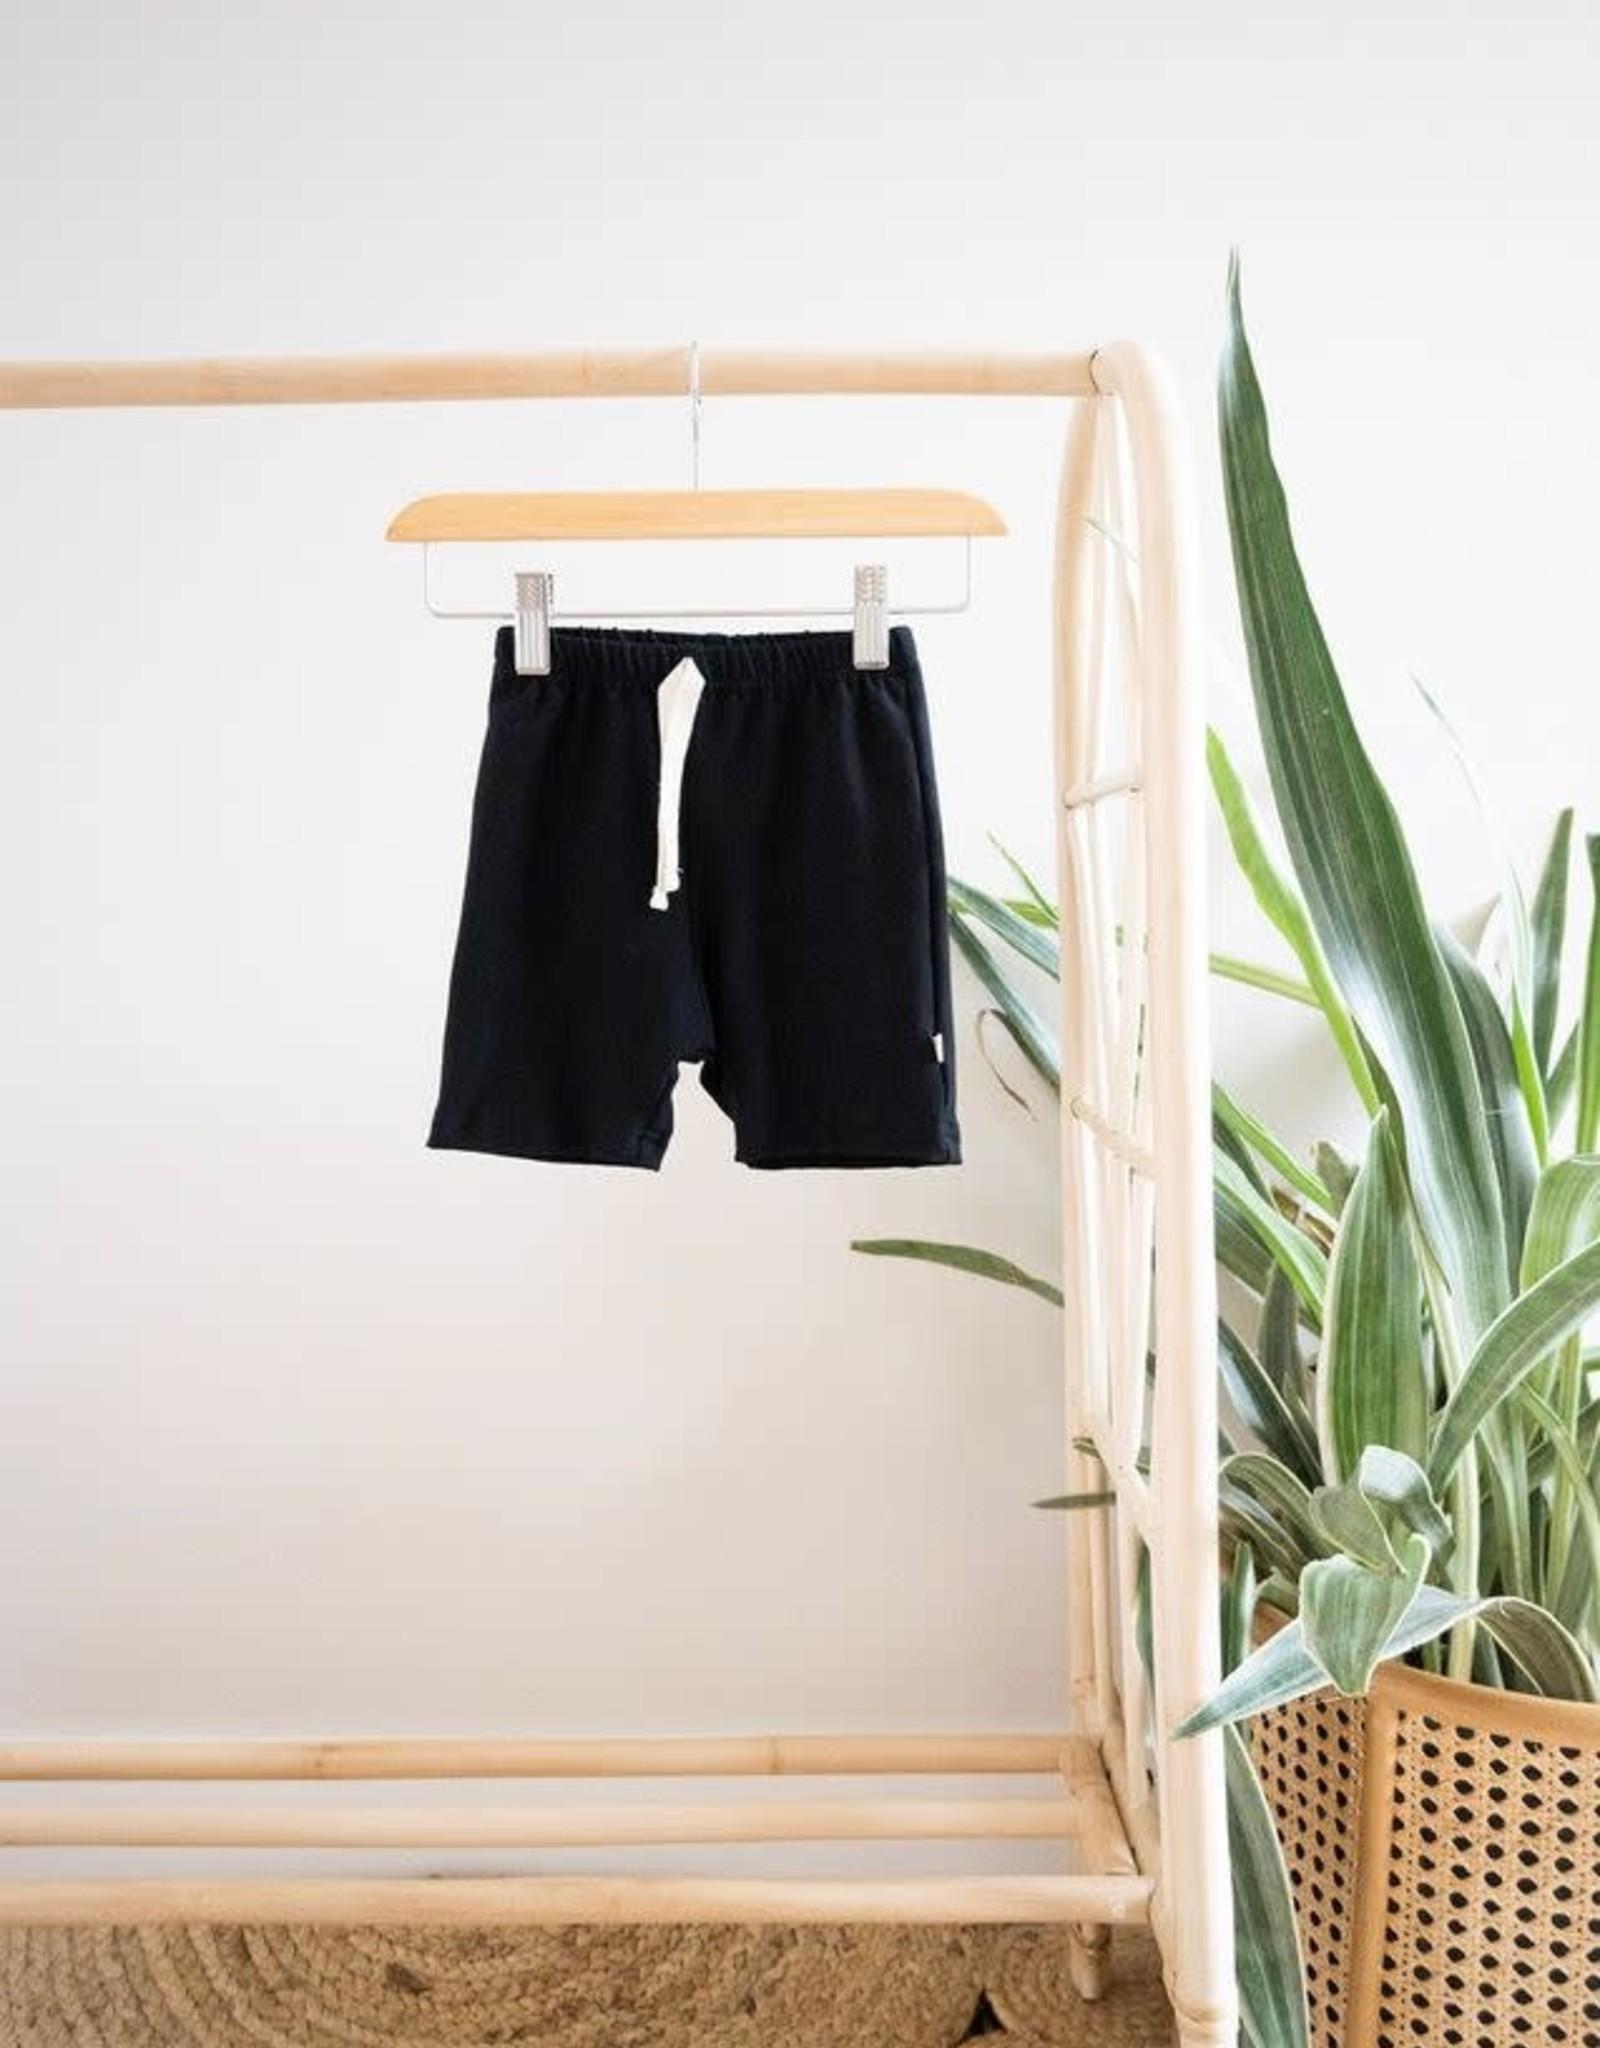 Jax & Lennon Jax & Lennon Kids Everyday Shorts